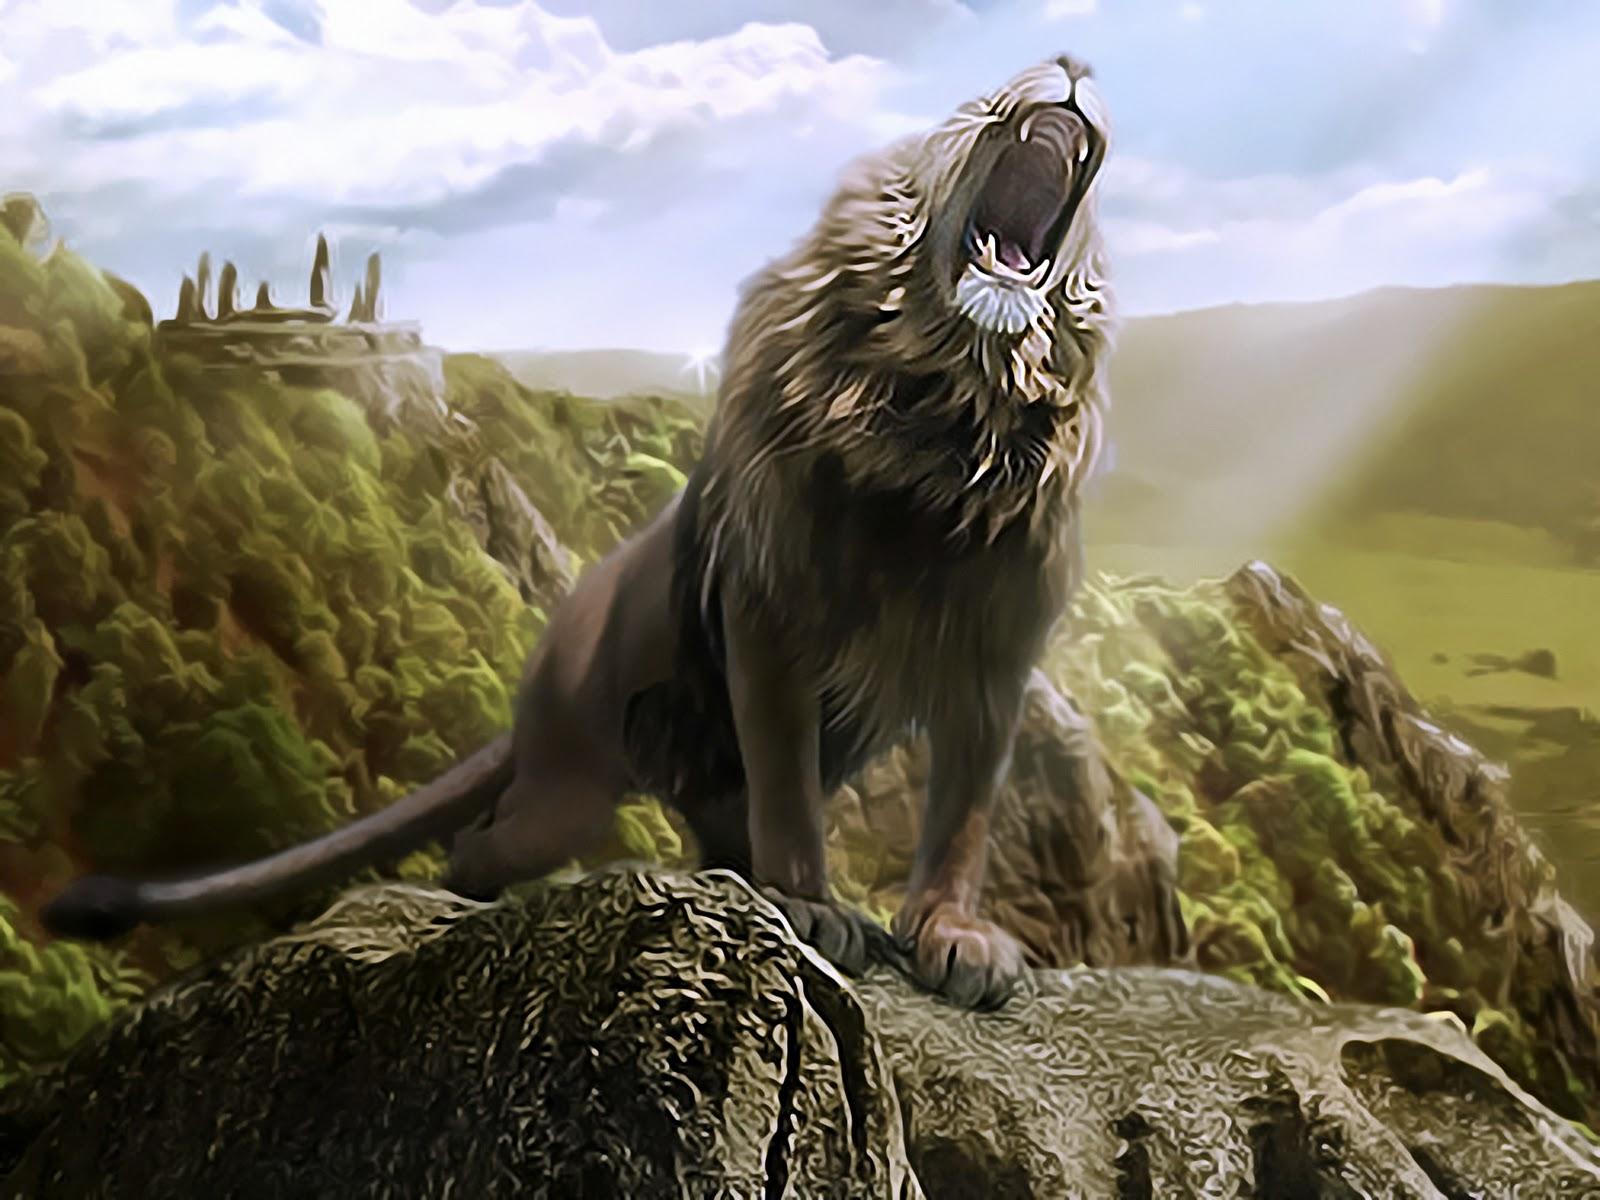 http://4.bp.blogspot.com/_Hrh98i7uFqo/TSvJ4j8TgHI/AAAAAAAAADM/NX469ZvA0R0/s1600/Lion+Painting+Wallpaper.jpg